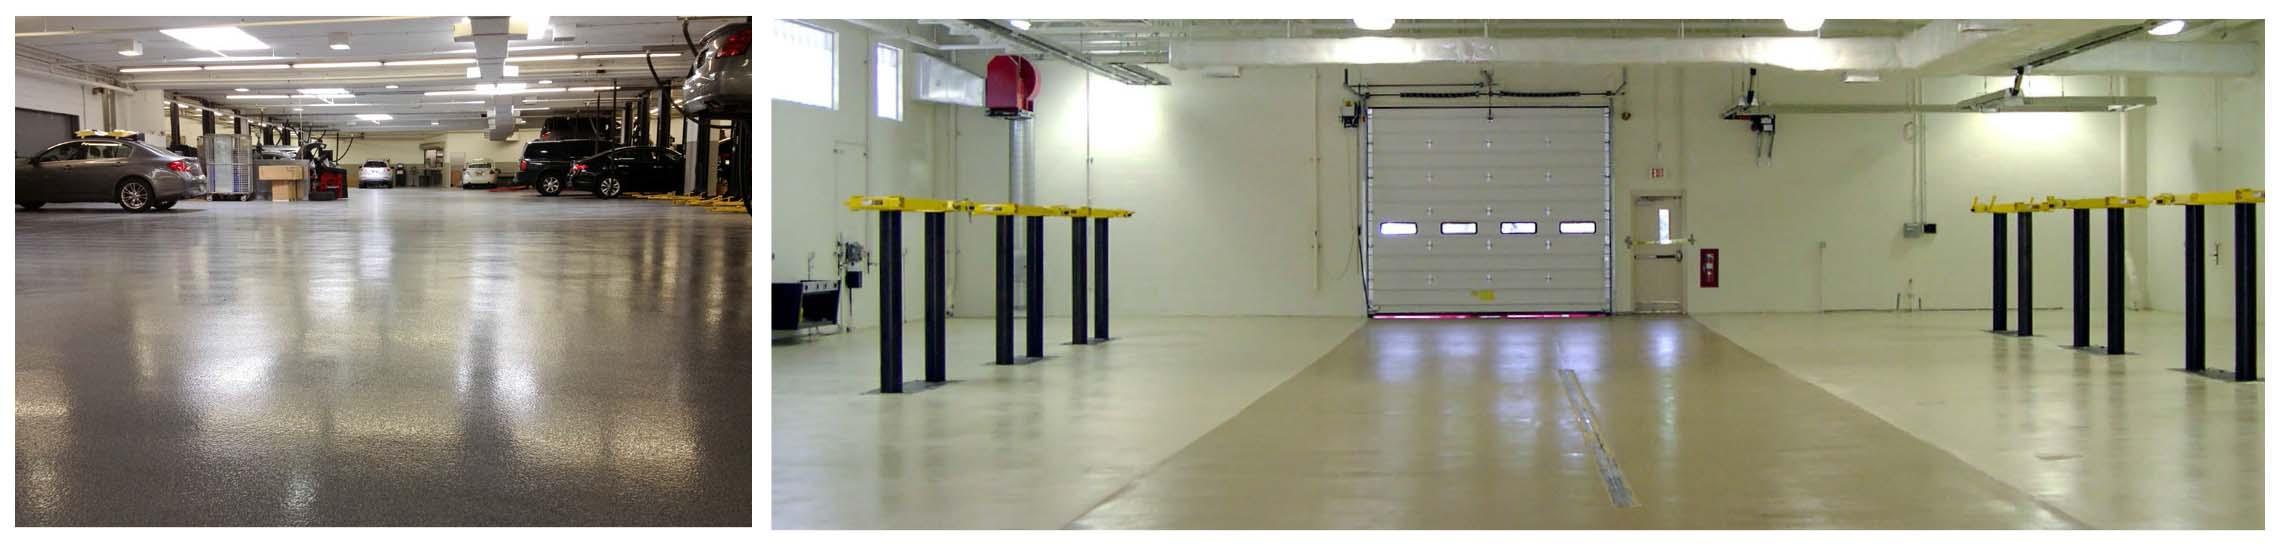 Concrete Floor Coating Systems 2